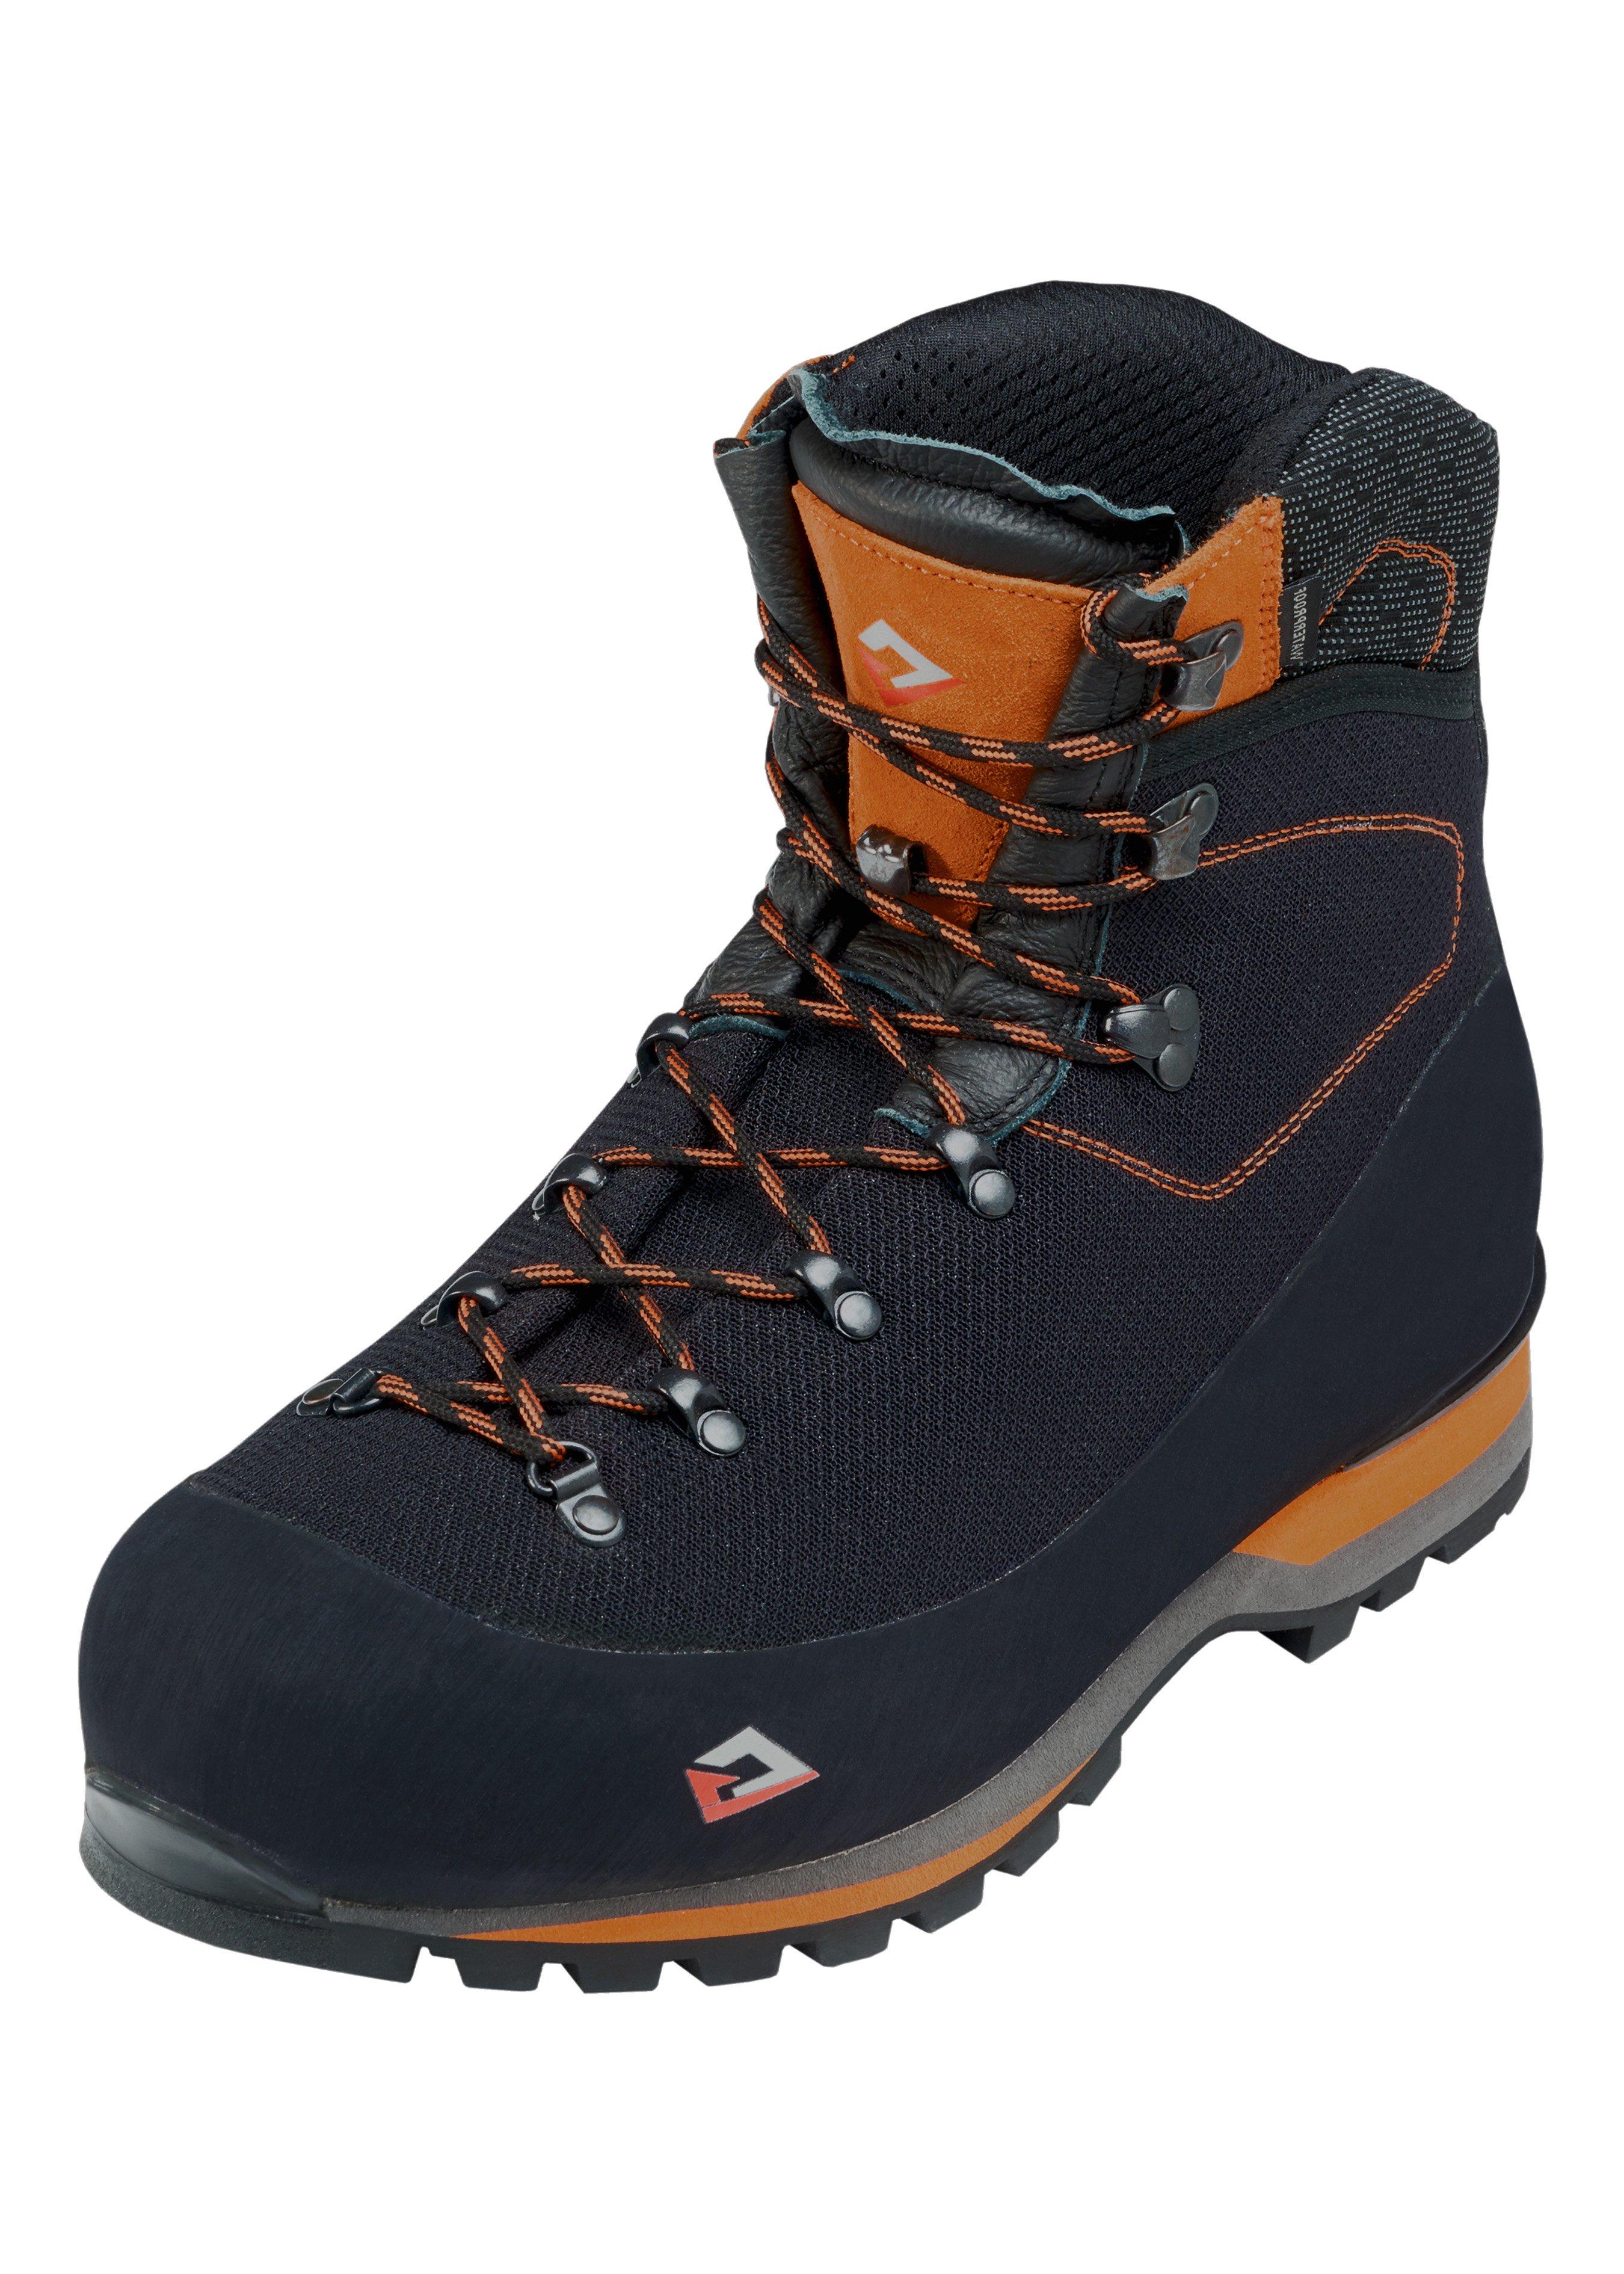 Gar Berg-Sicherheitsschuh S3 Mountain 42851038 0